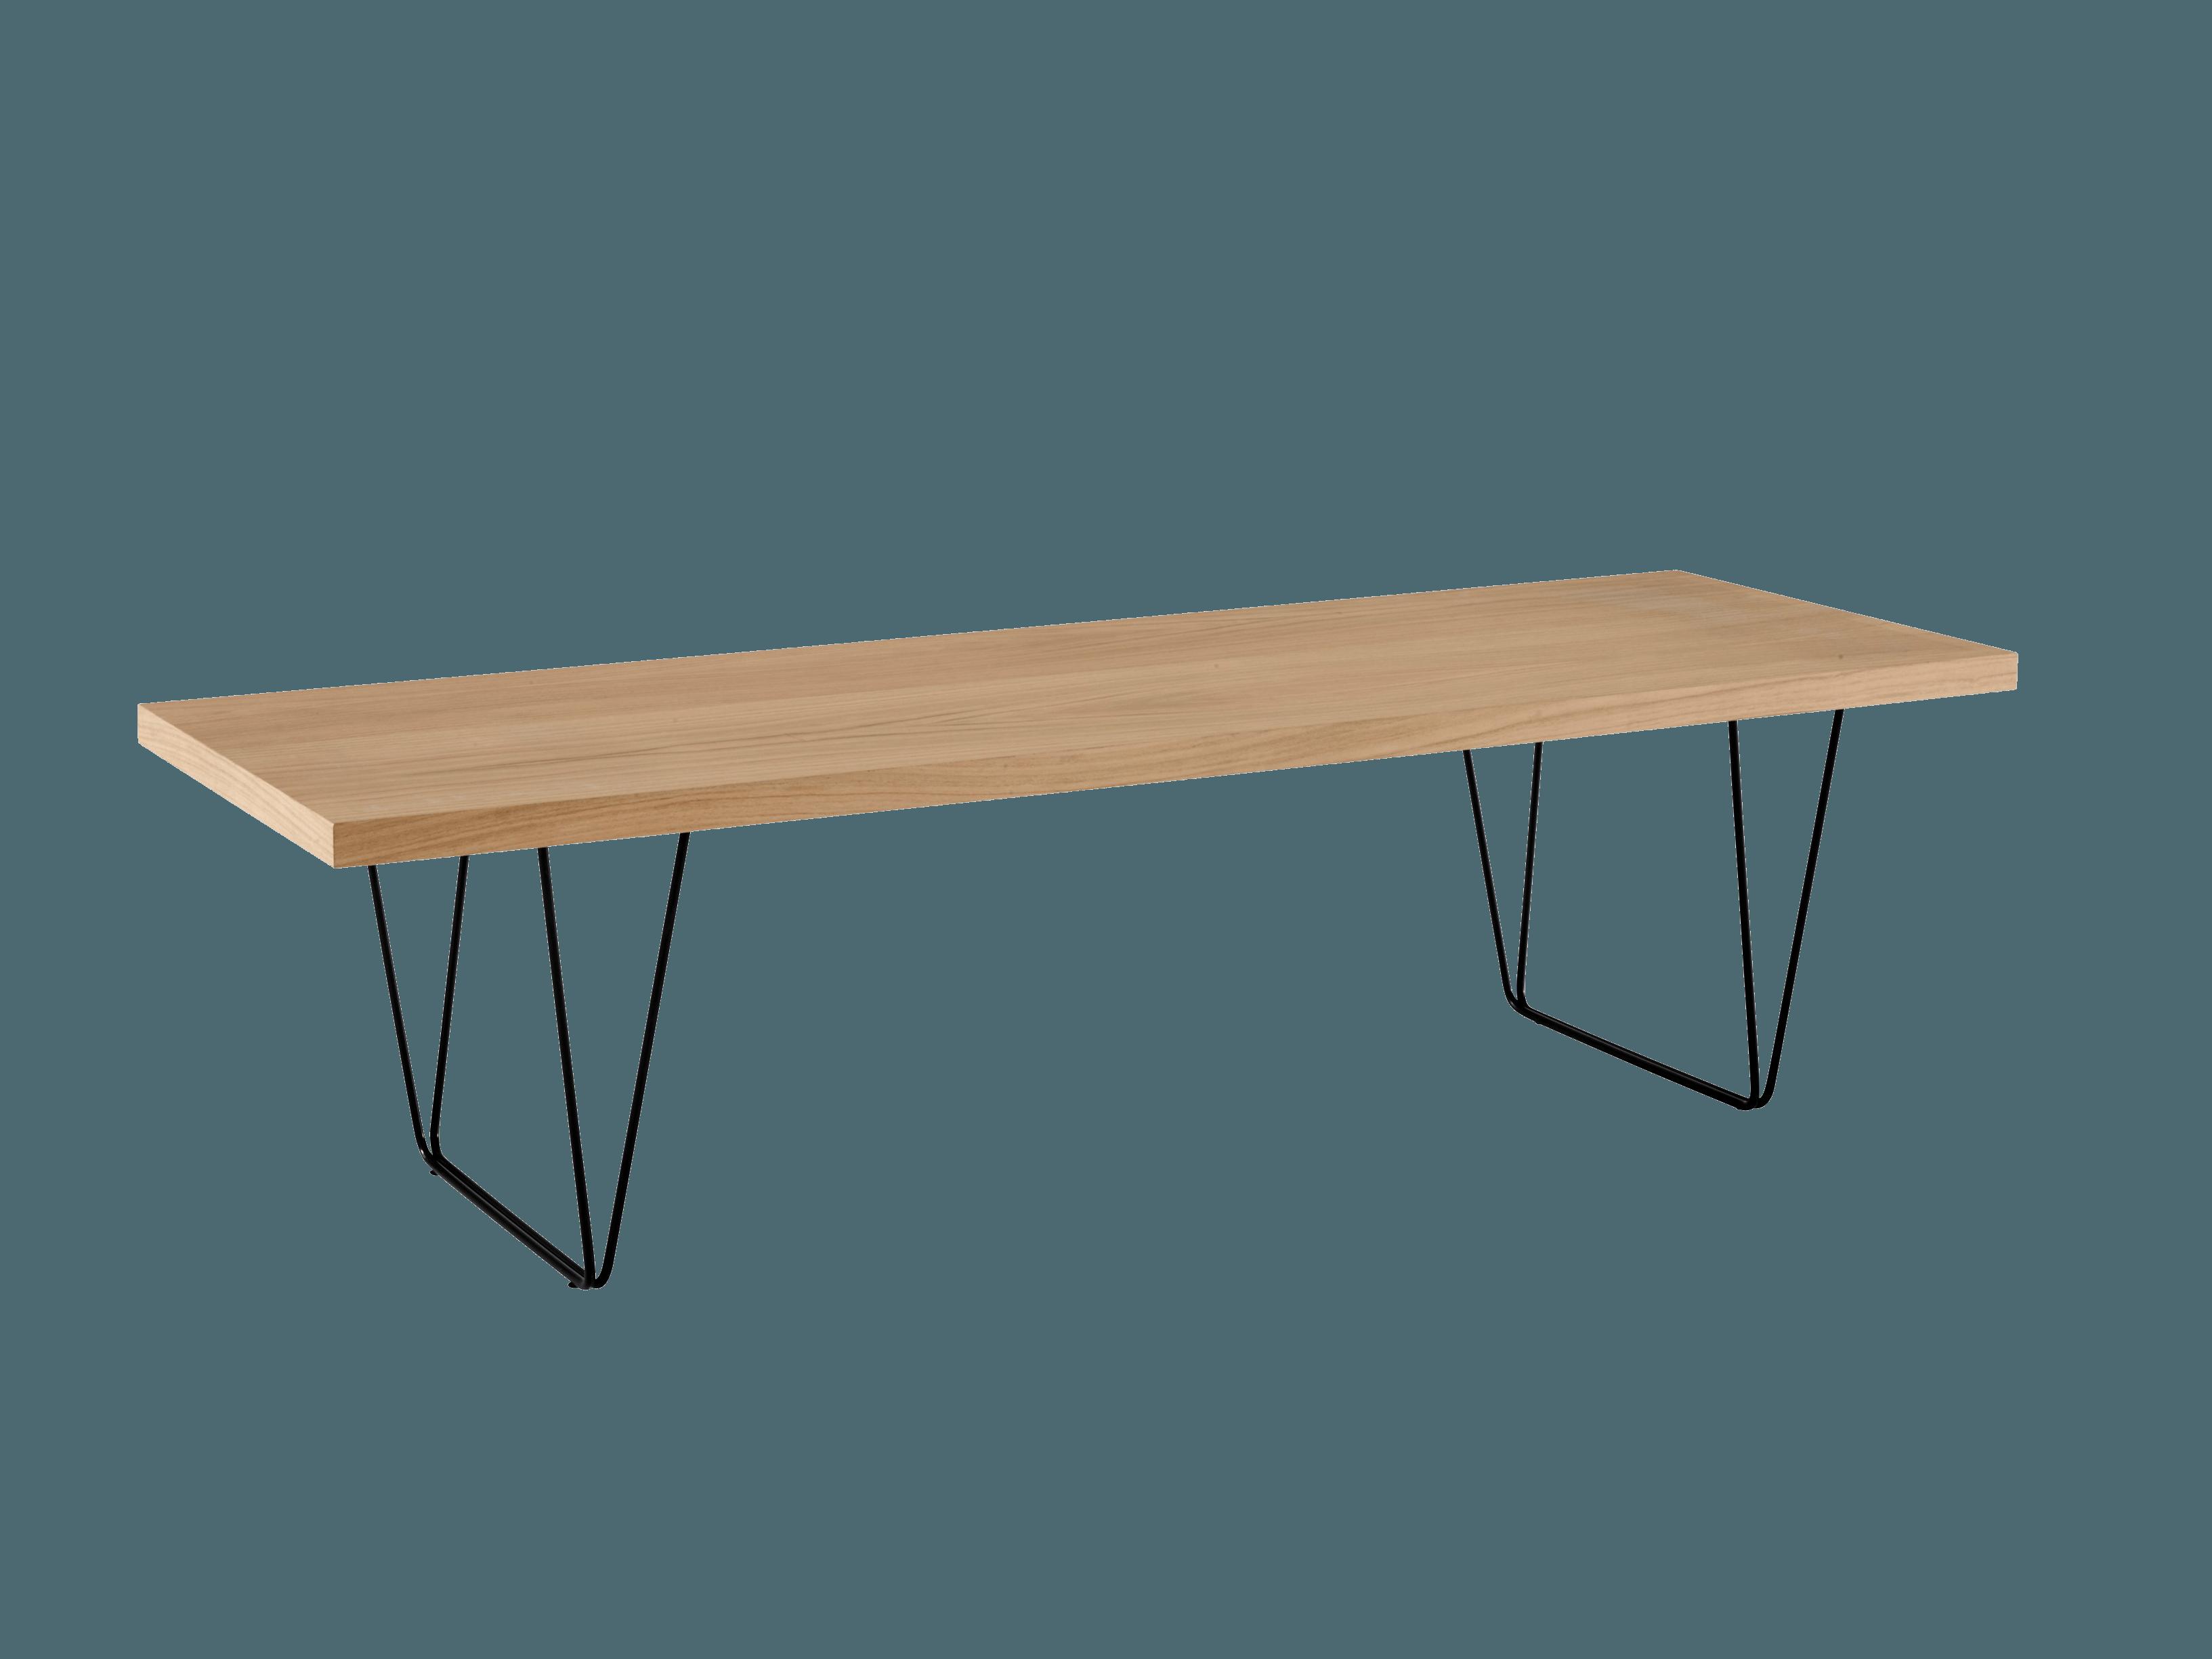 Table cm191 pierre paulin the socialite family - Table basse pierre paulin ...